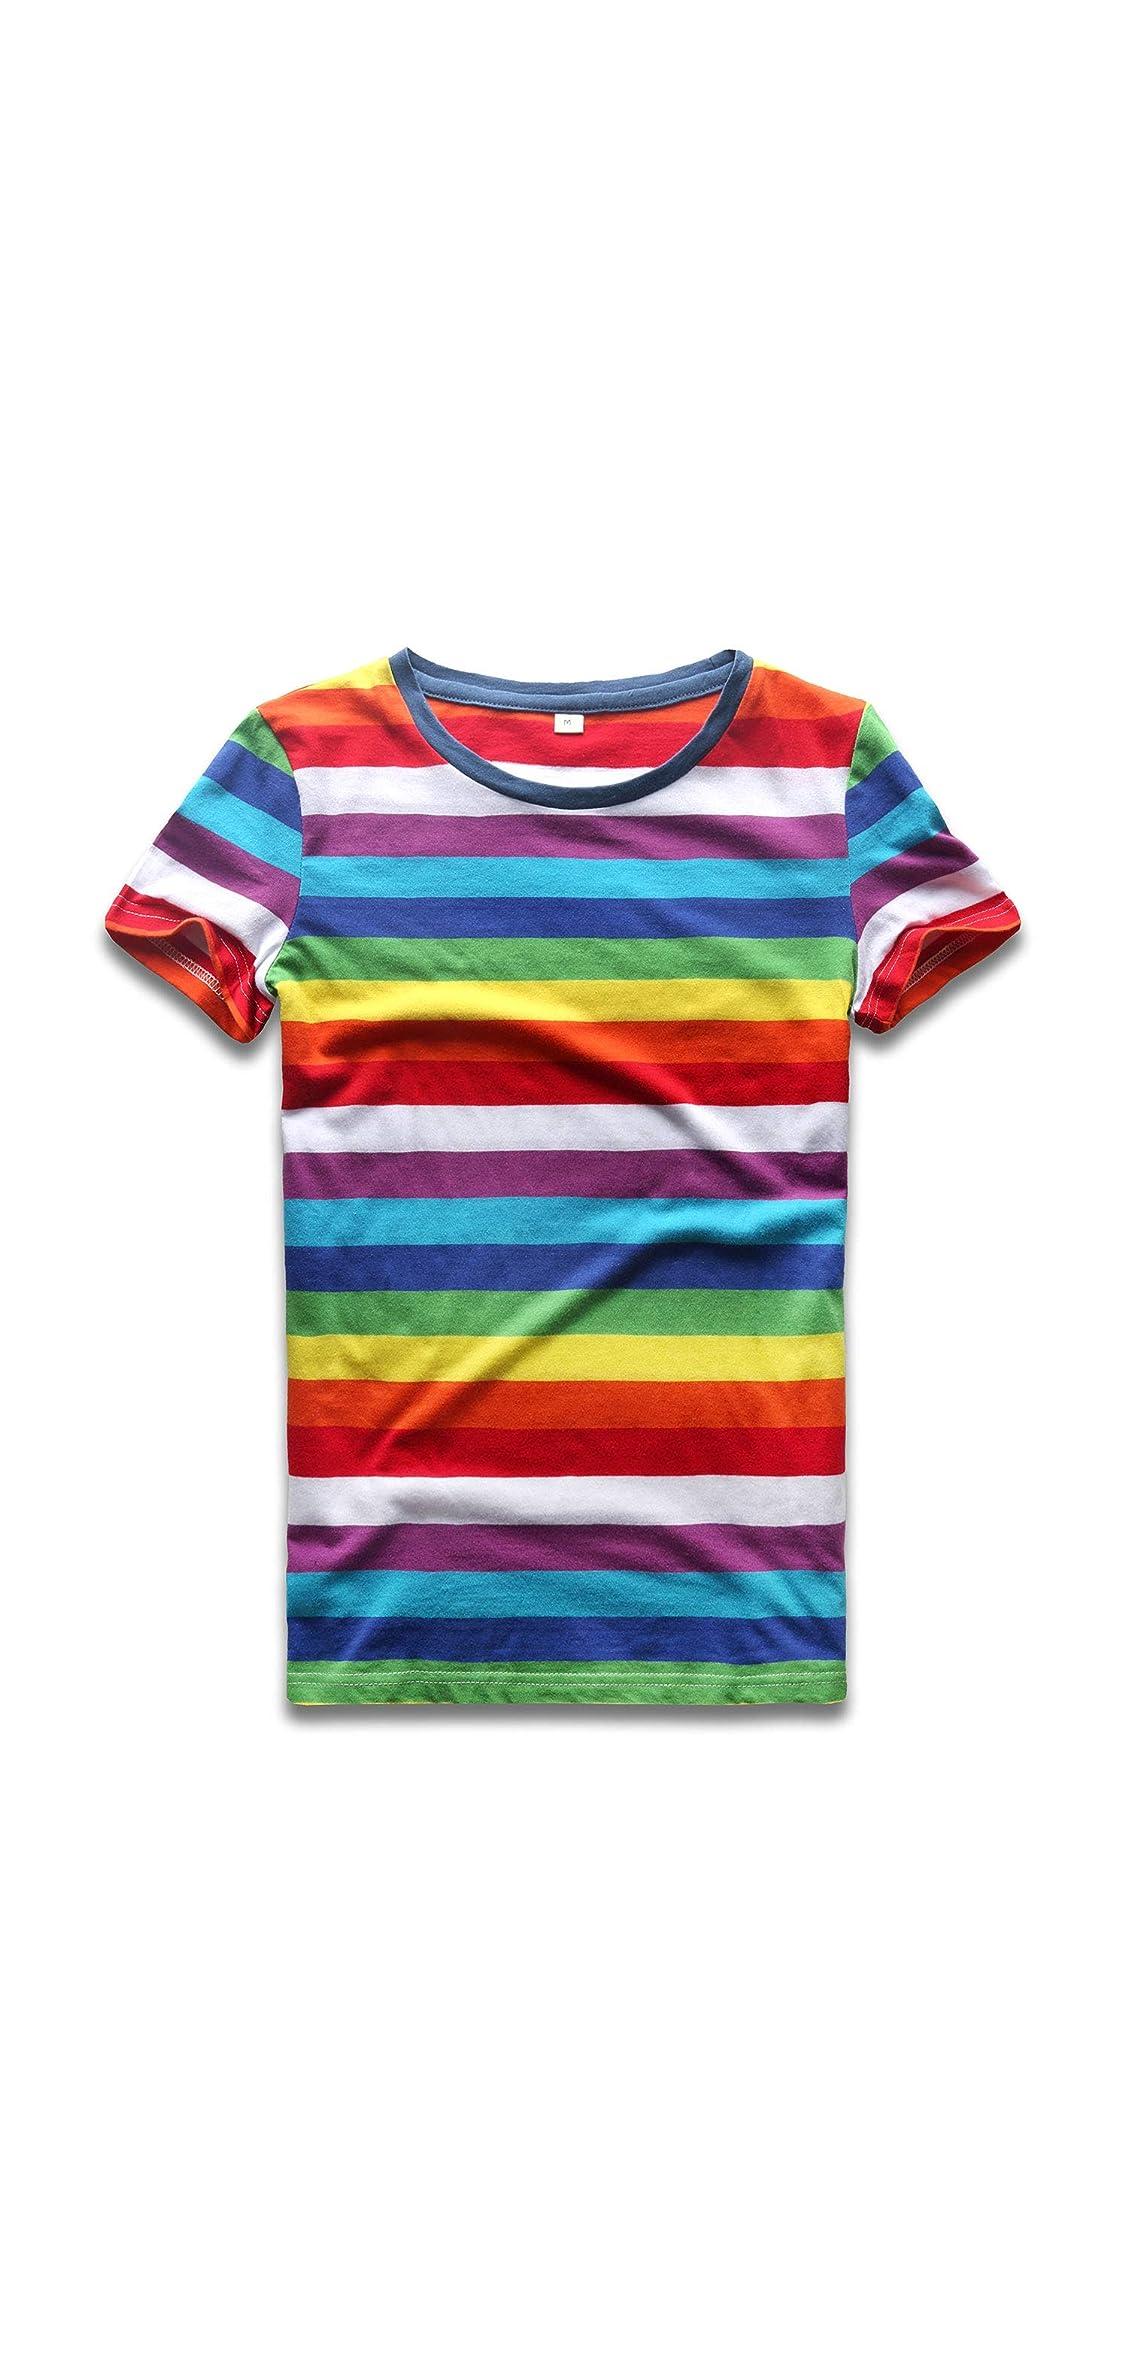 Rainbow T Shirt Women Striped Crew Neck Short Sleeve Stripes Tee